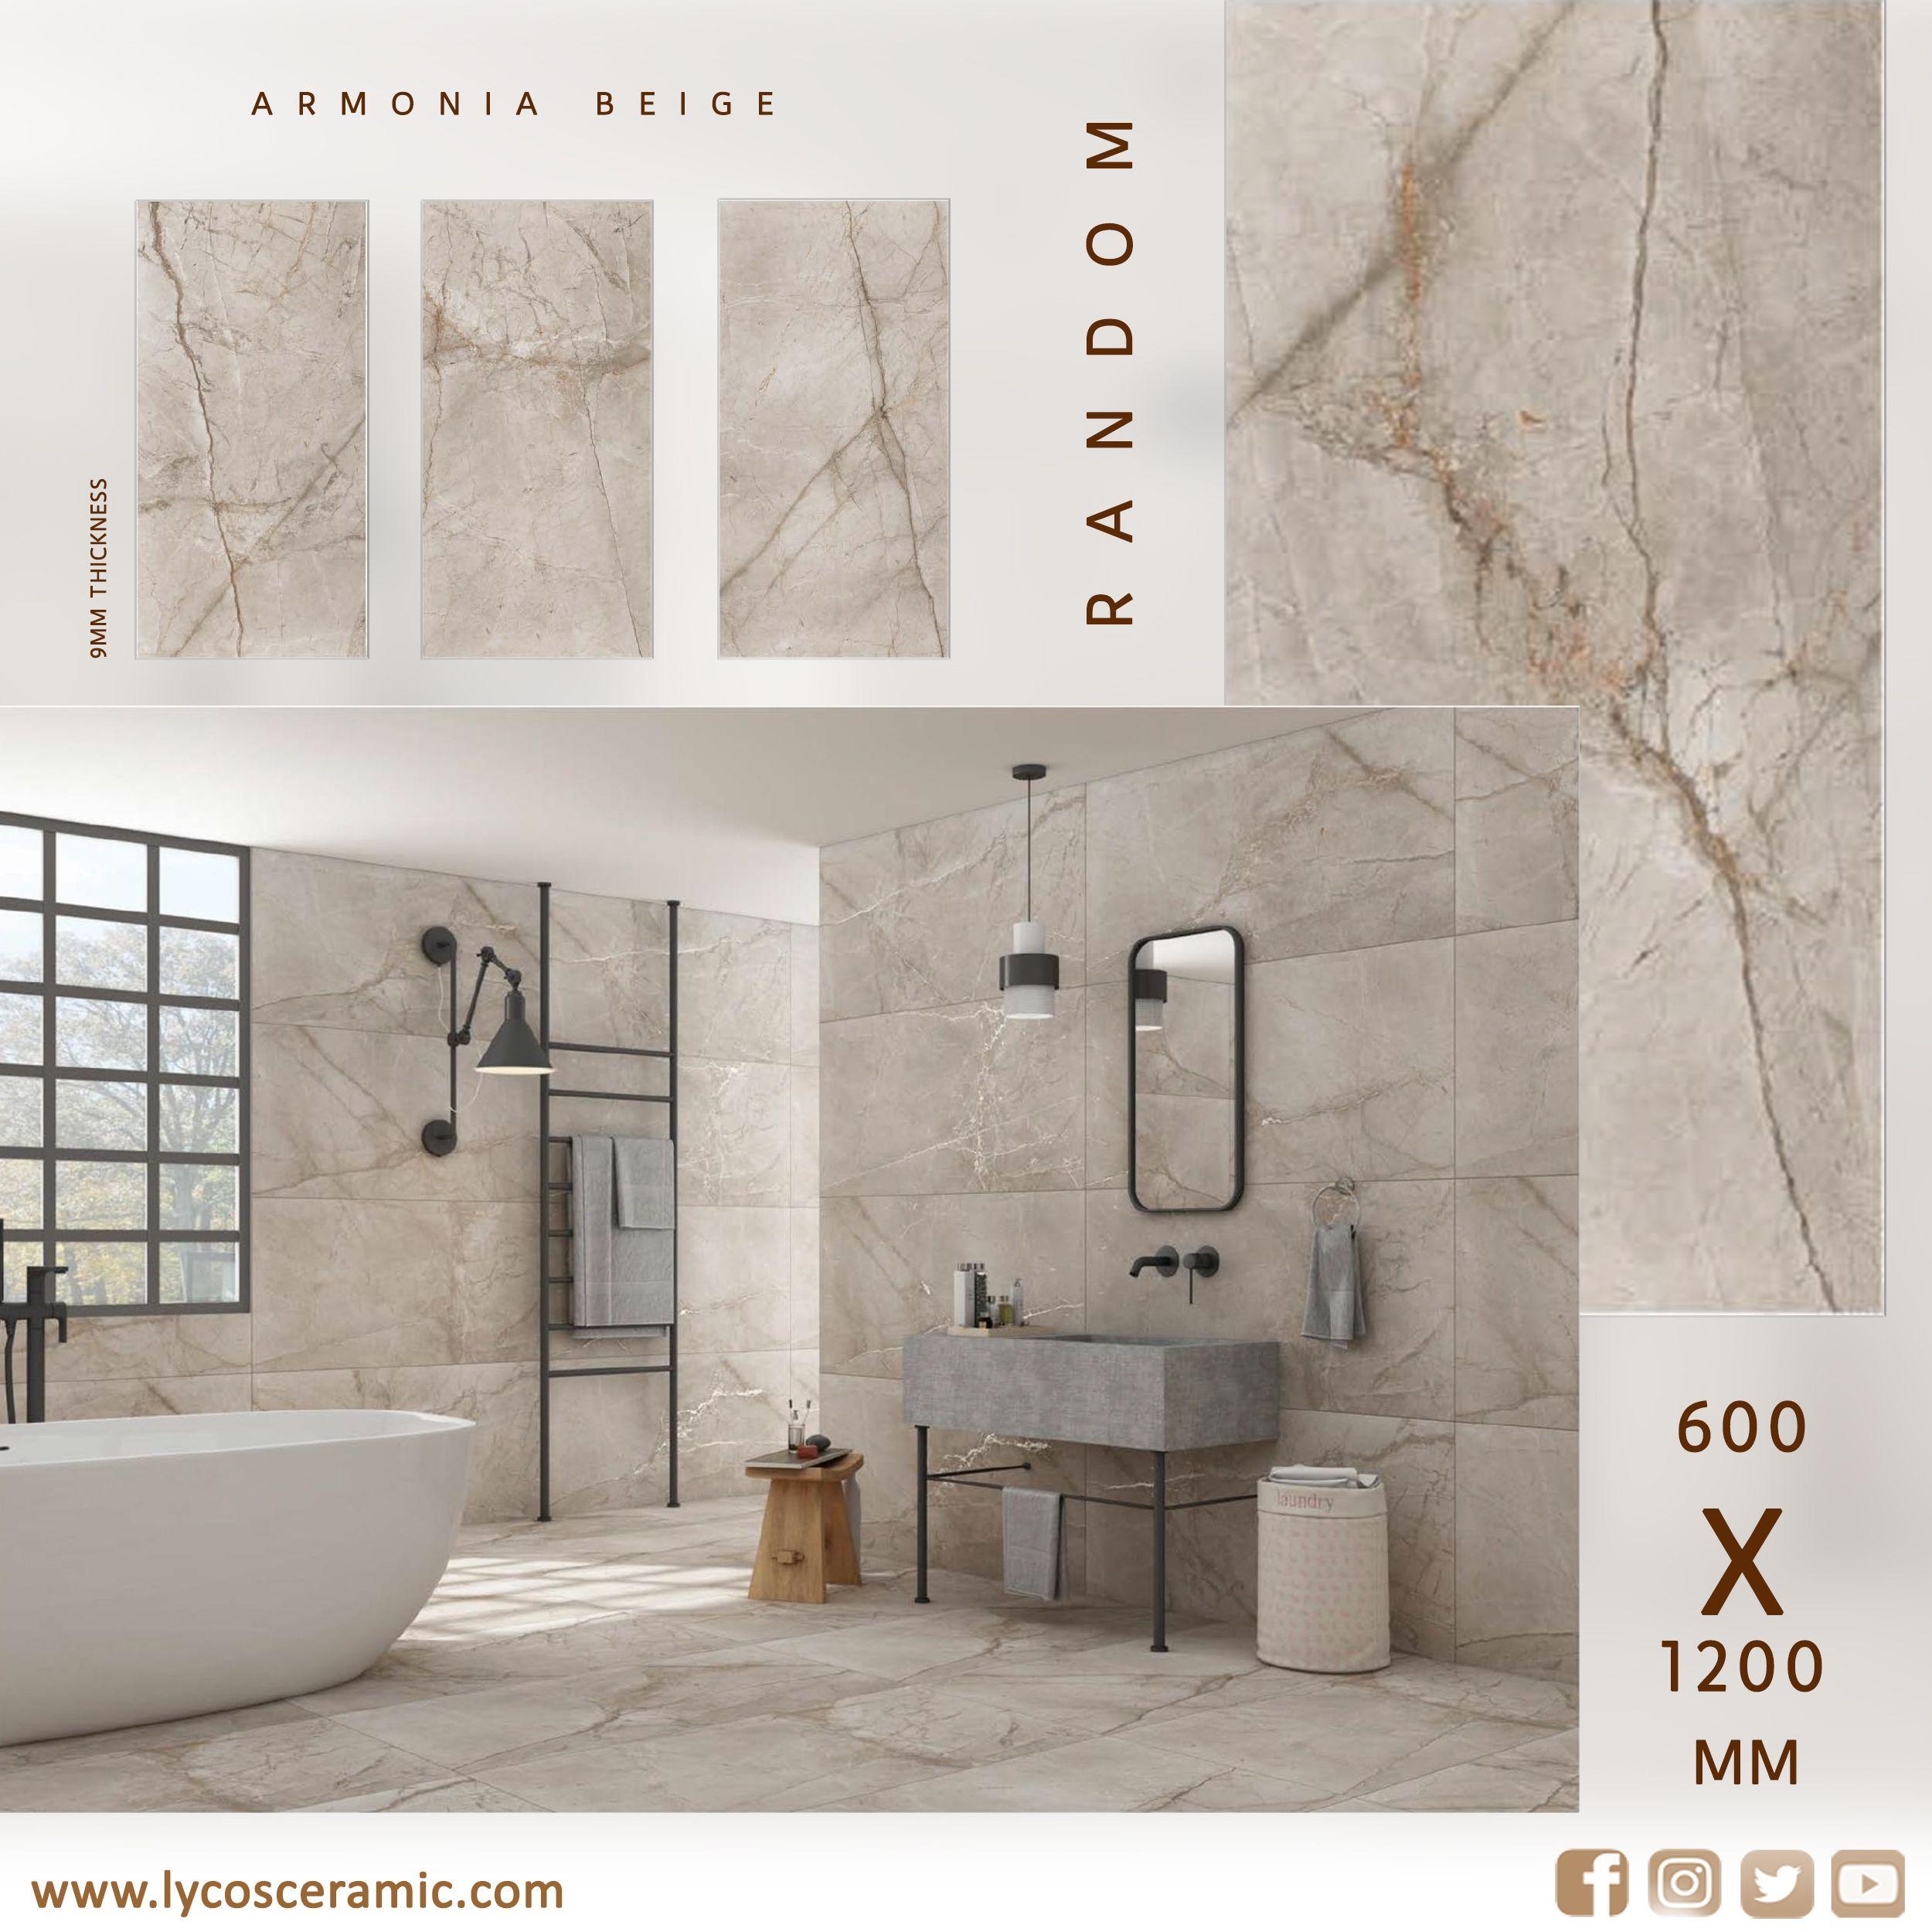 60x120 Cm Porcelain Tile In 2020 Tile Bathroom Porcelain Flooring Room Tiles